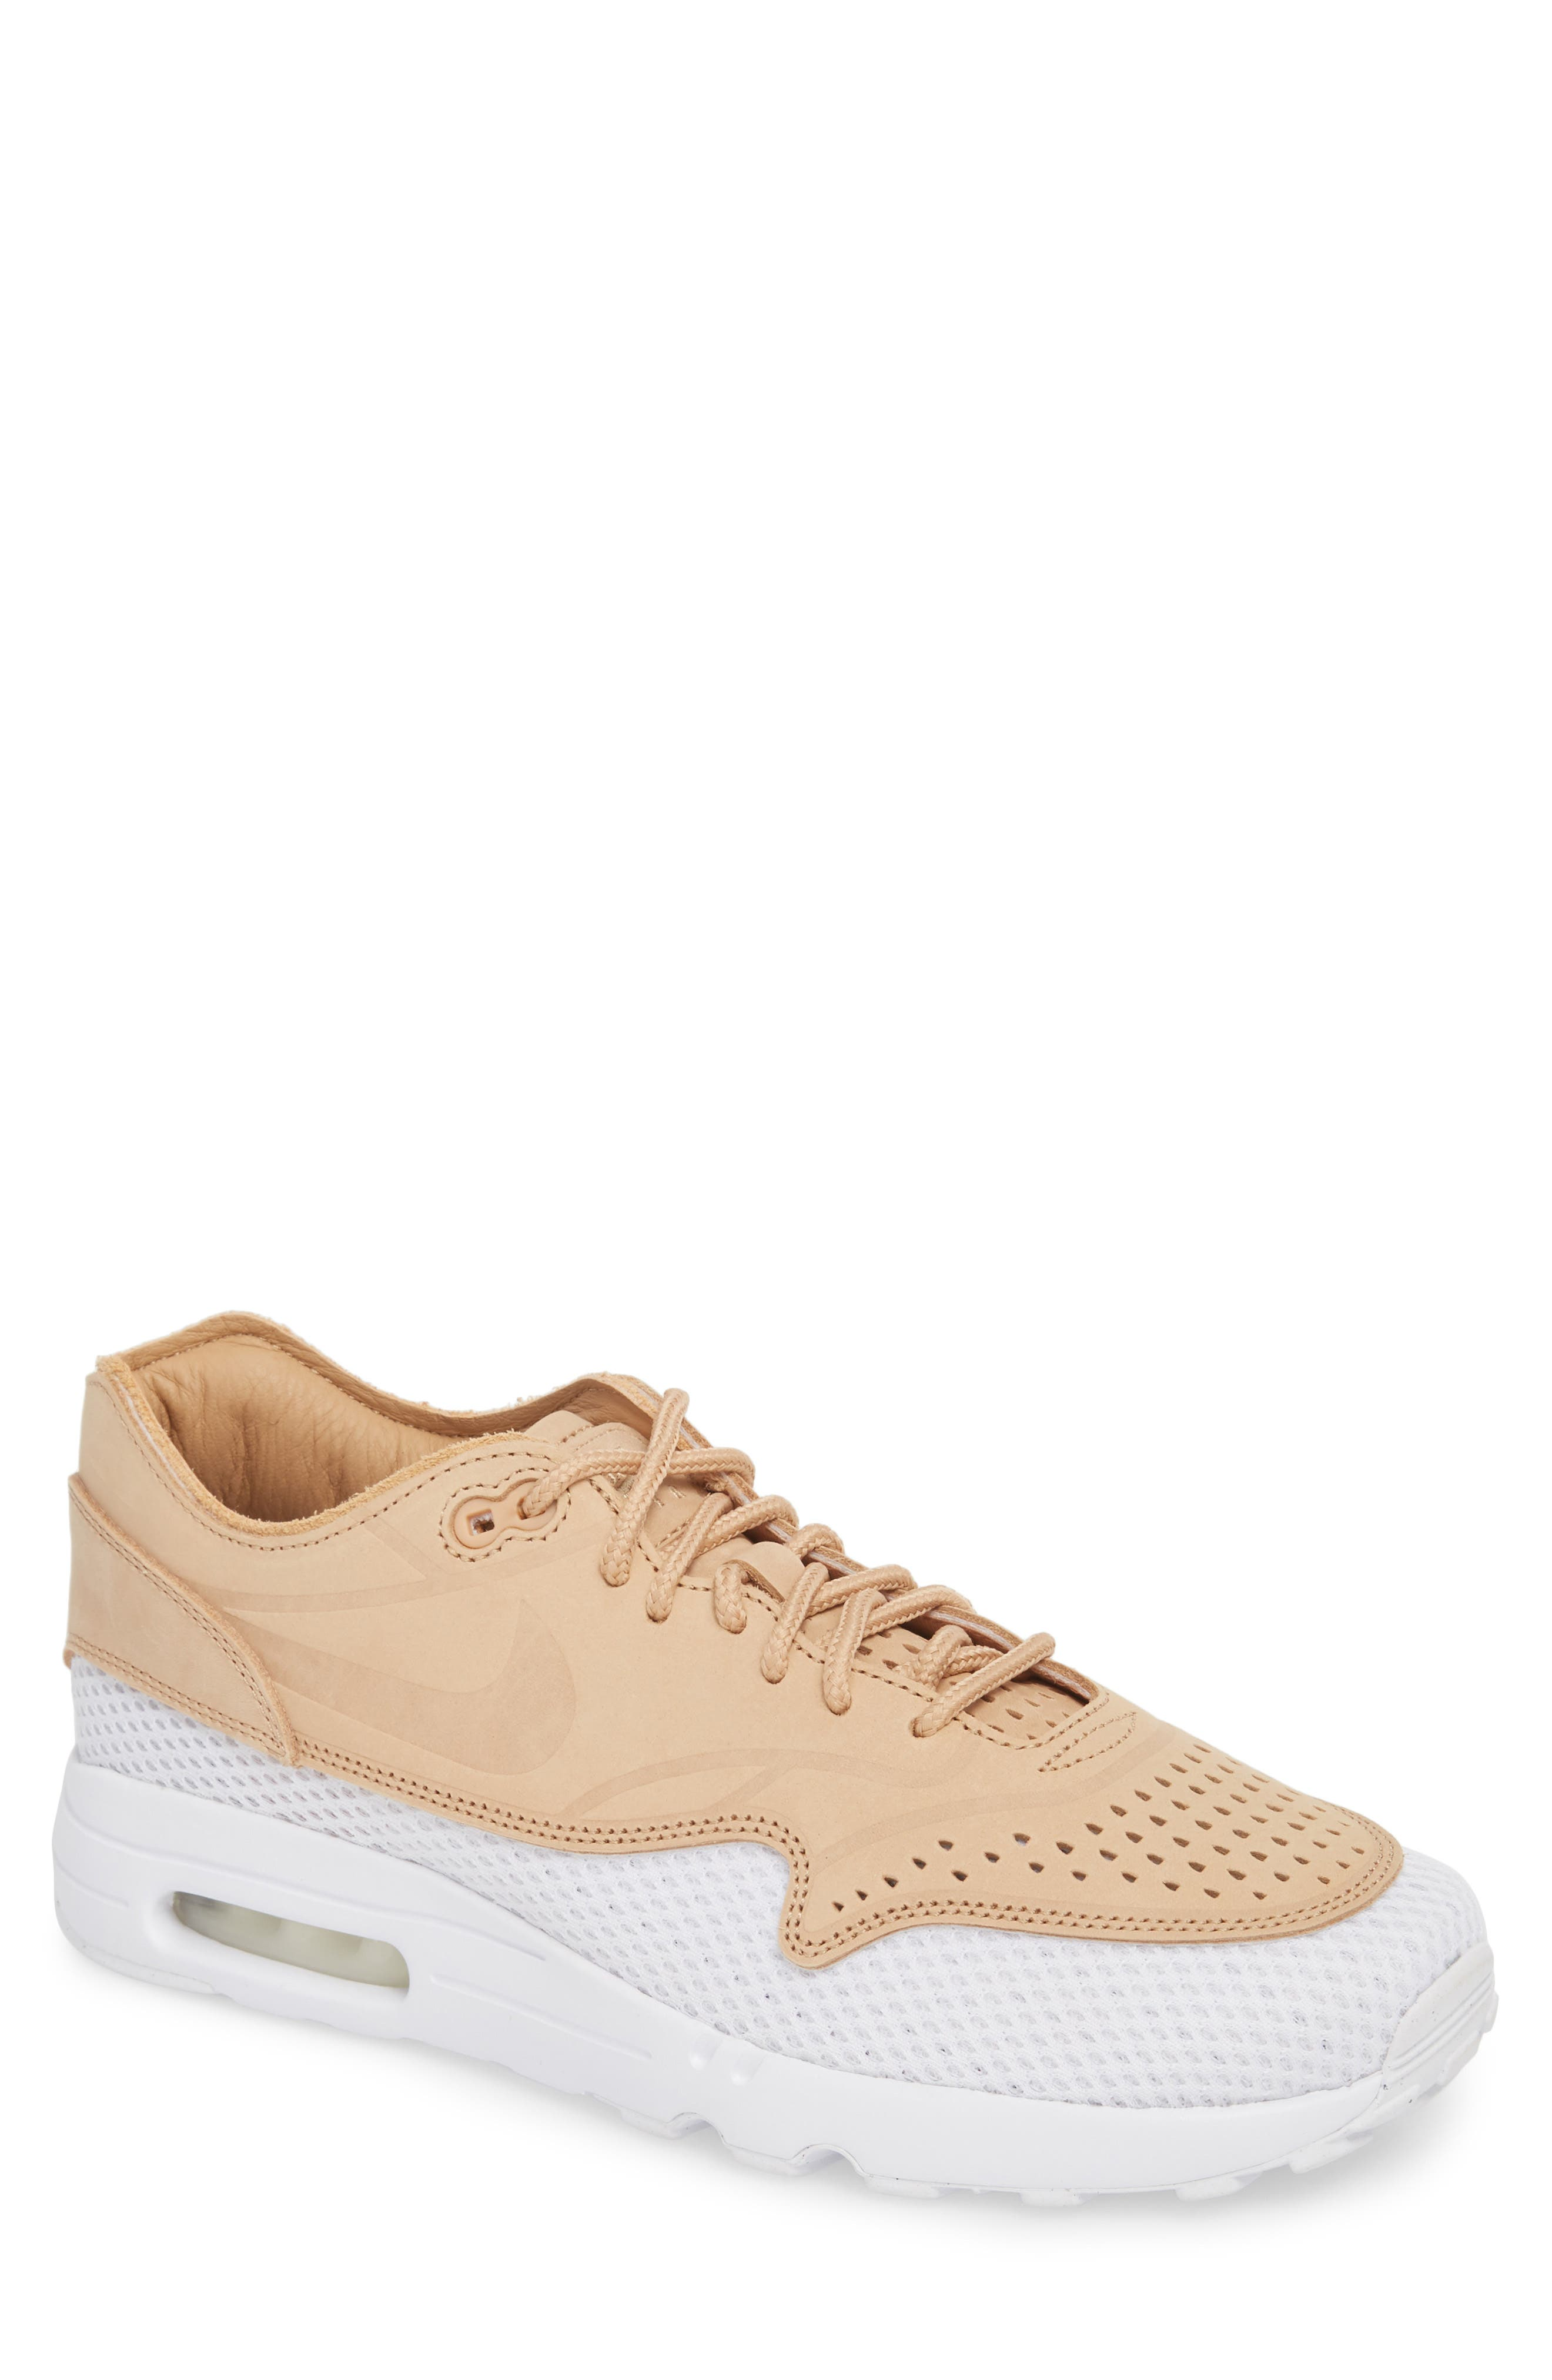 Air Max 1 Ultra 2.0 Premium Sneaker,                         Main,                         color, Vachetta Tan/ White